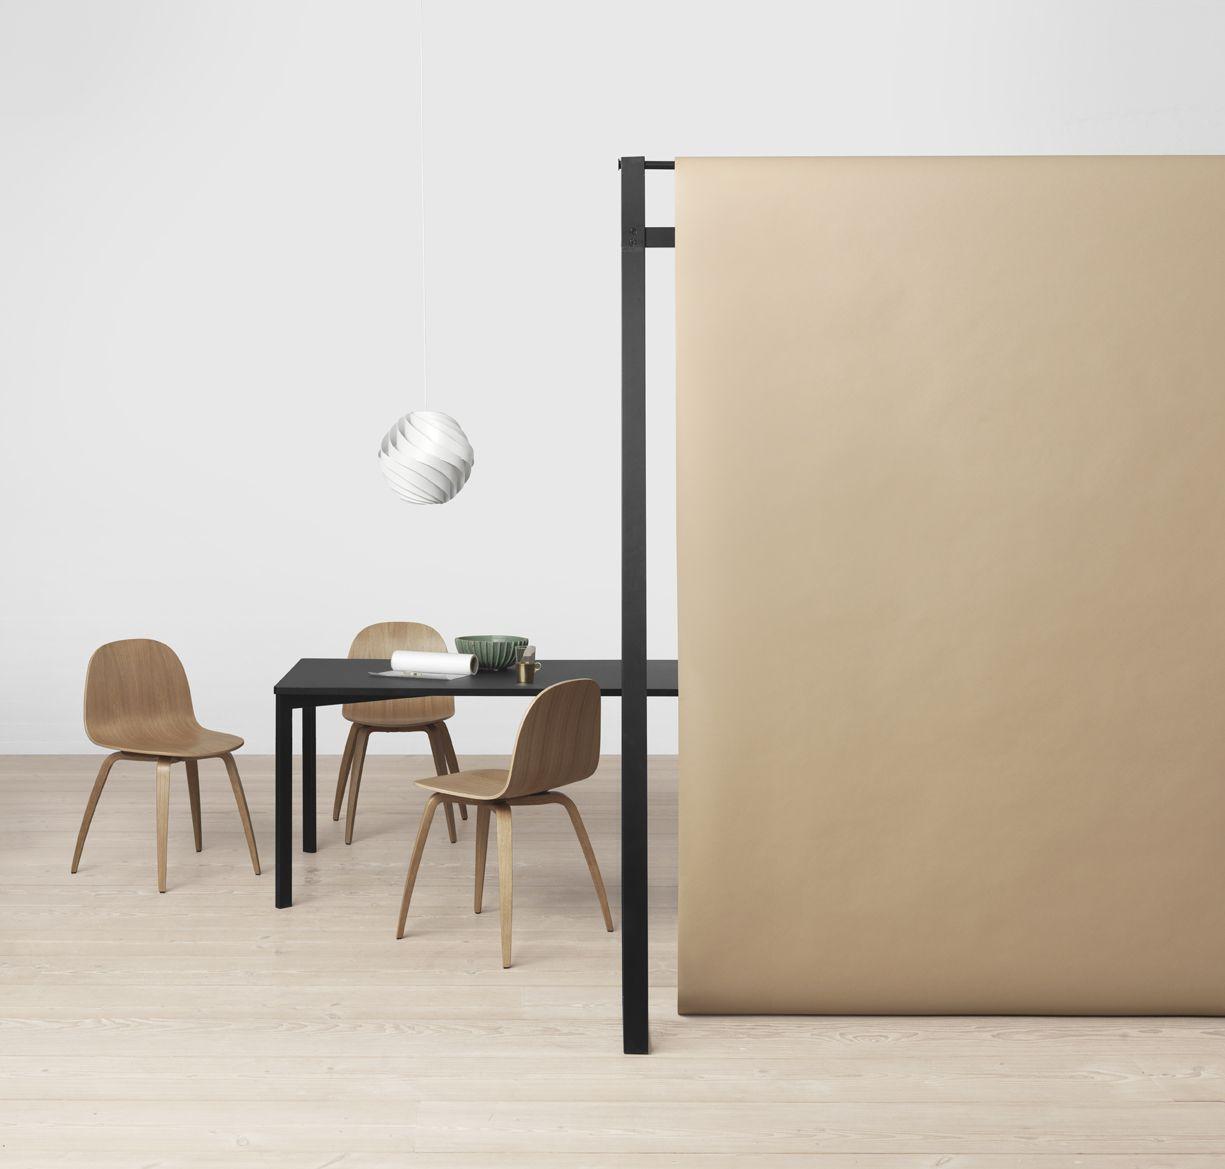 GUBI - Gubi Chair 2D, Y! Table and Turbo Pendant http://decdesignecasa.blogspot.it